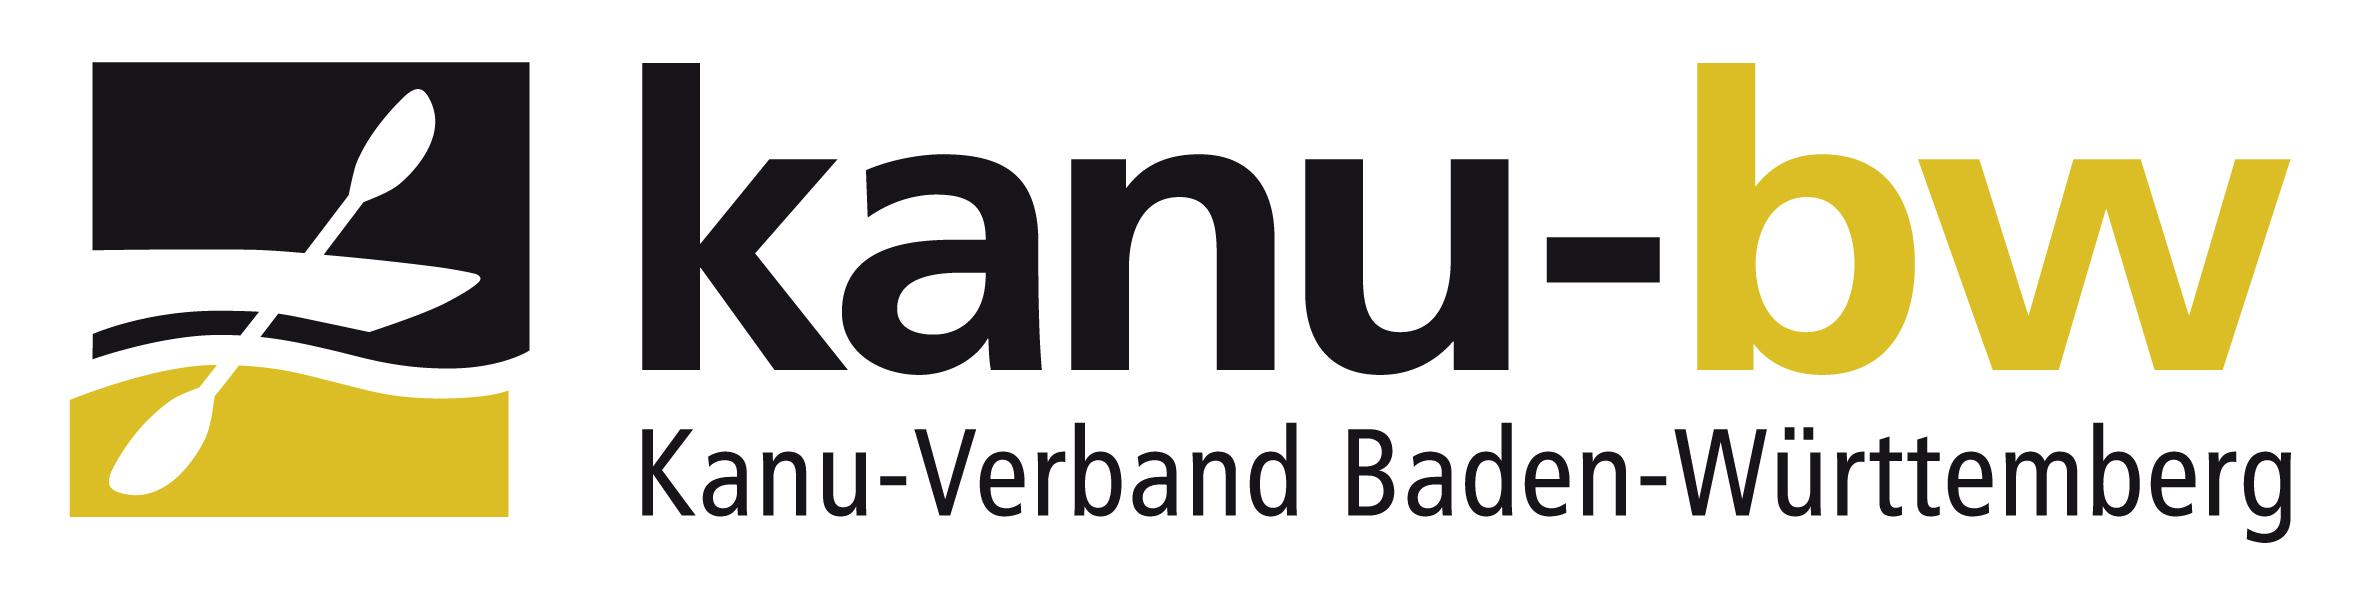 Kanu-Verband Baden-Württemberg